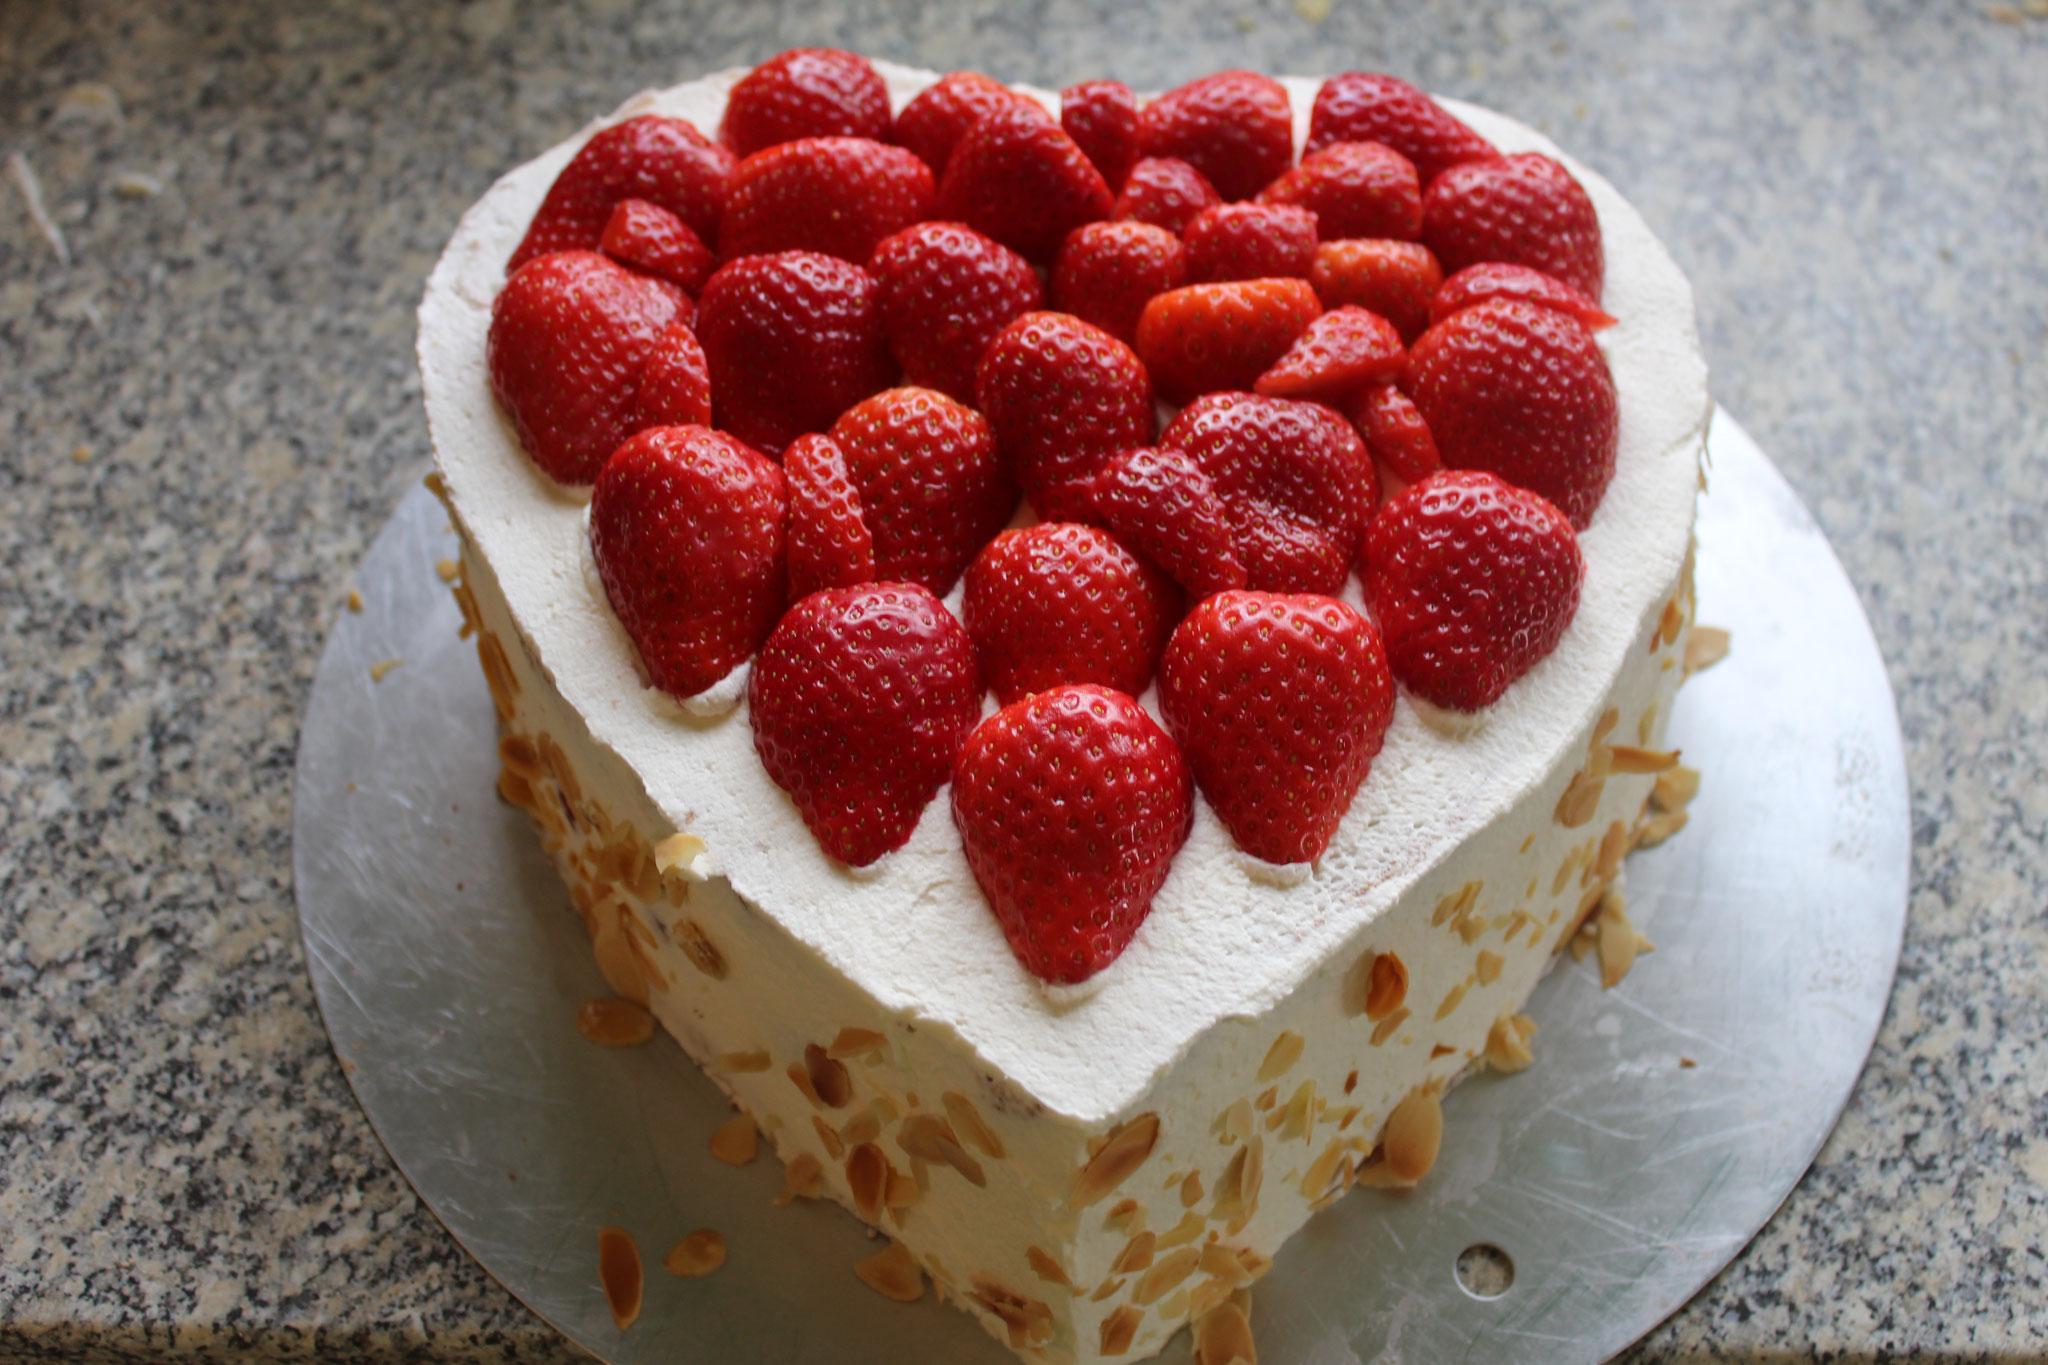 Erdbeeren aufsetzen - am Rand 1cm Platz lassen